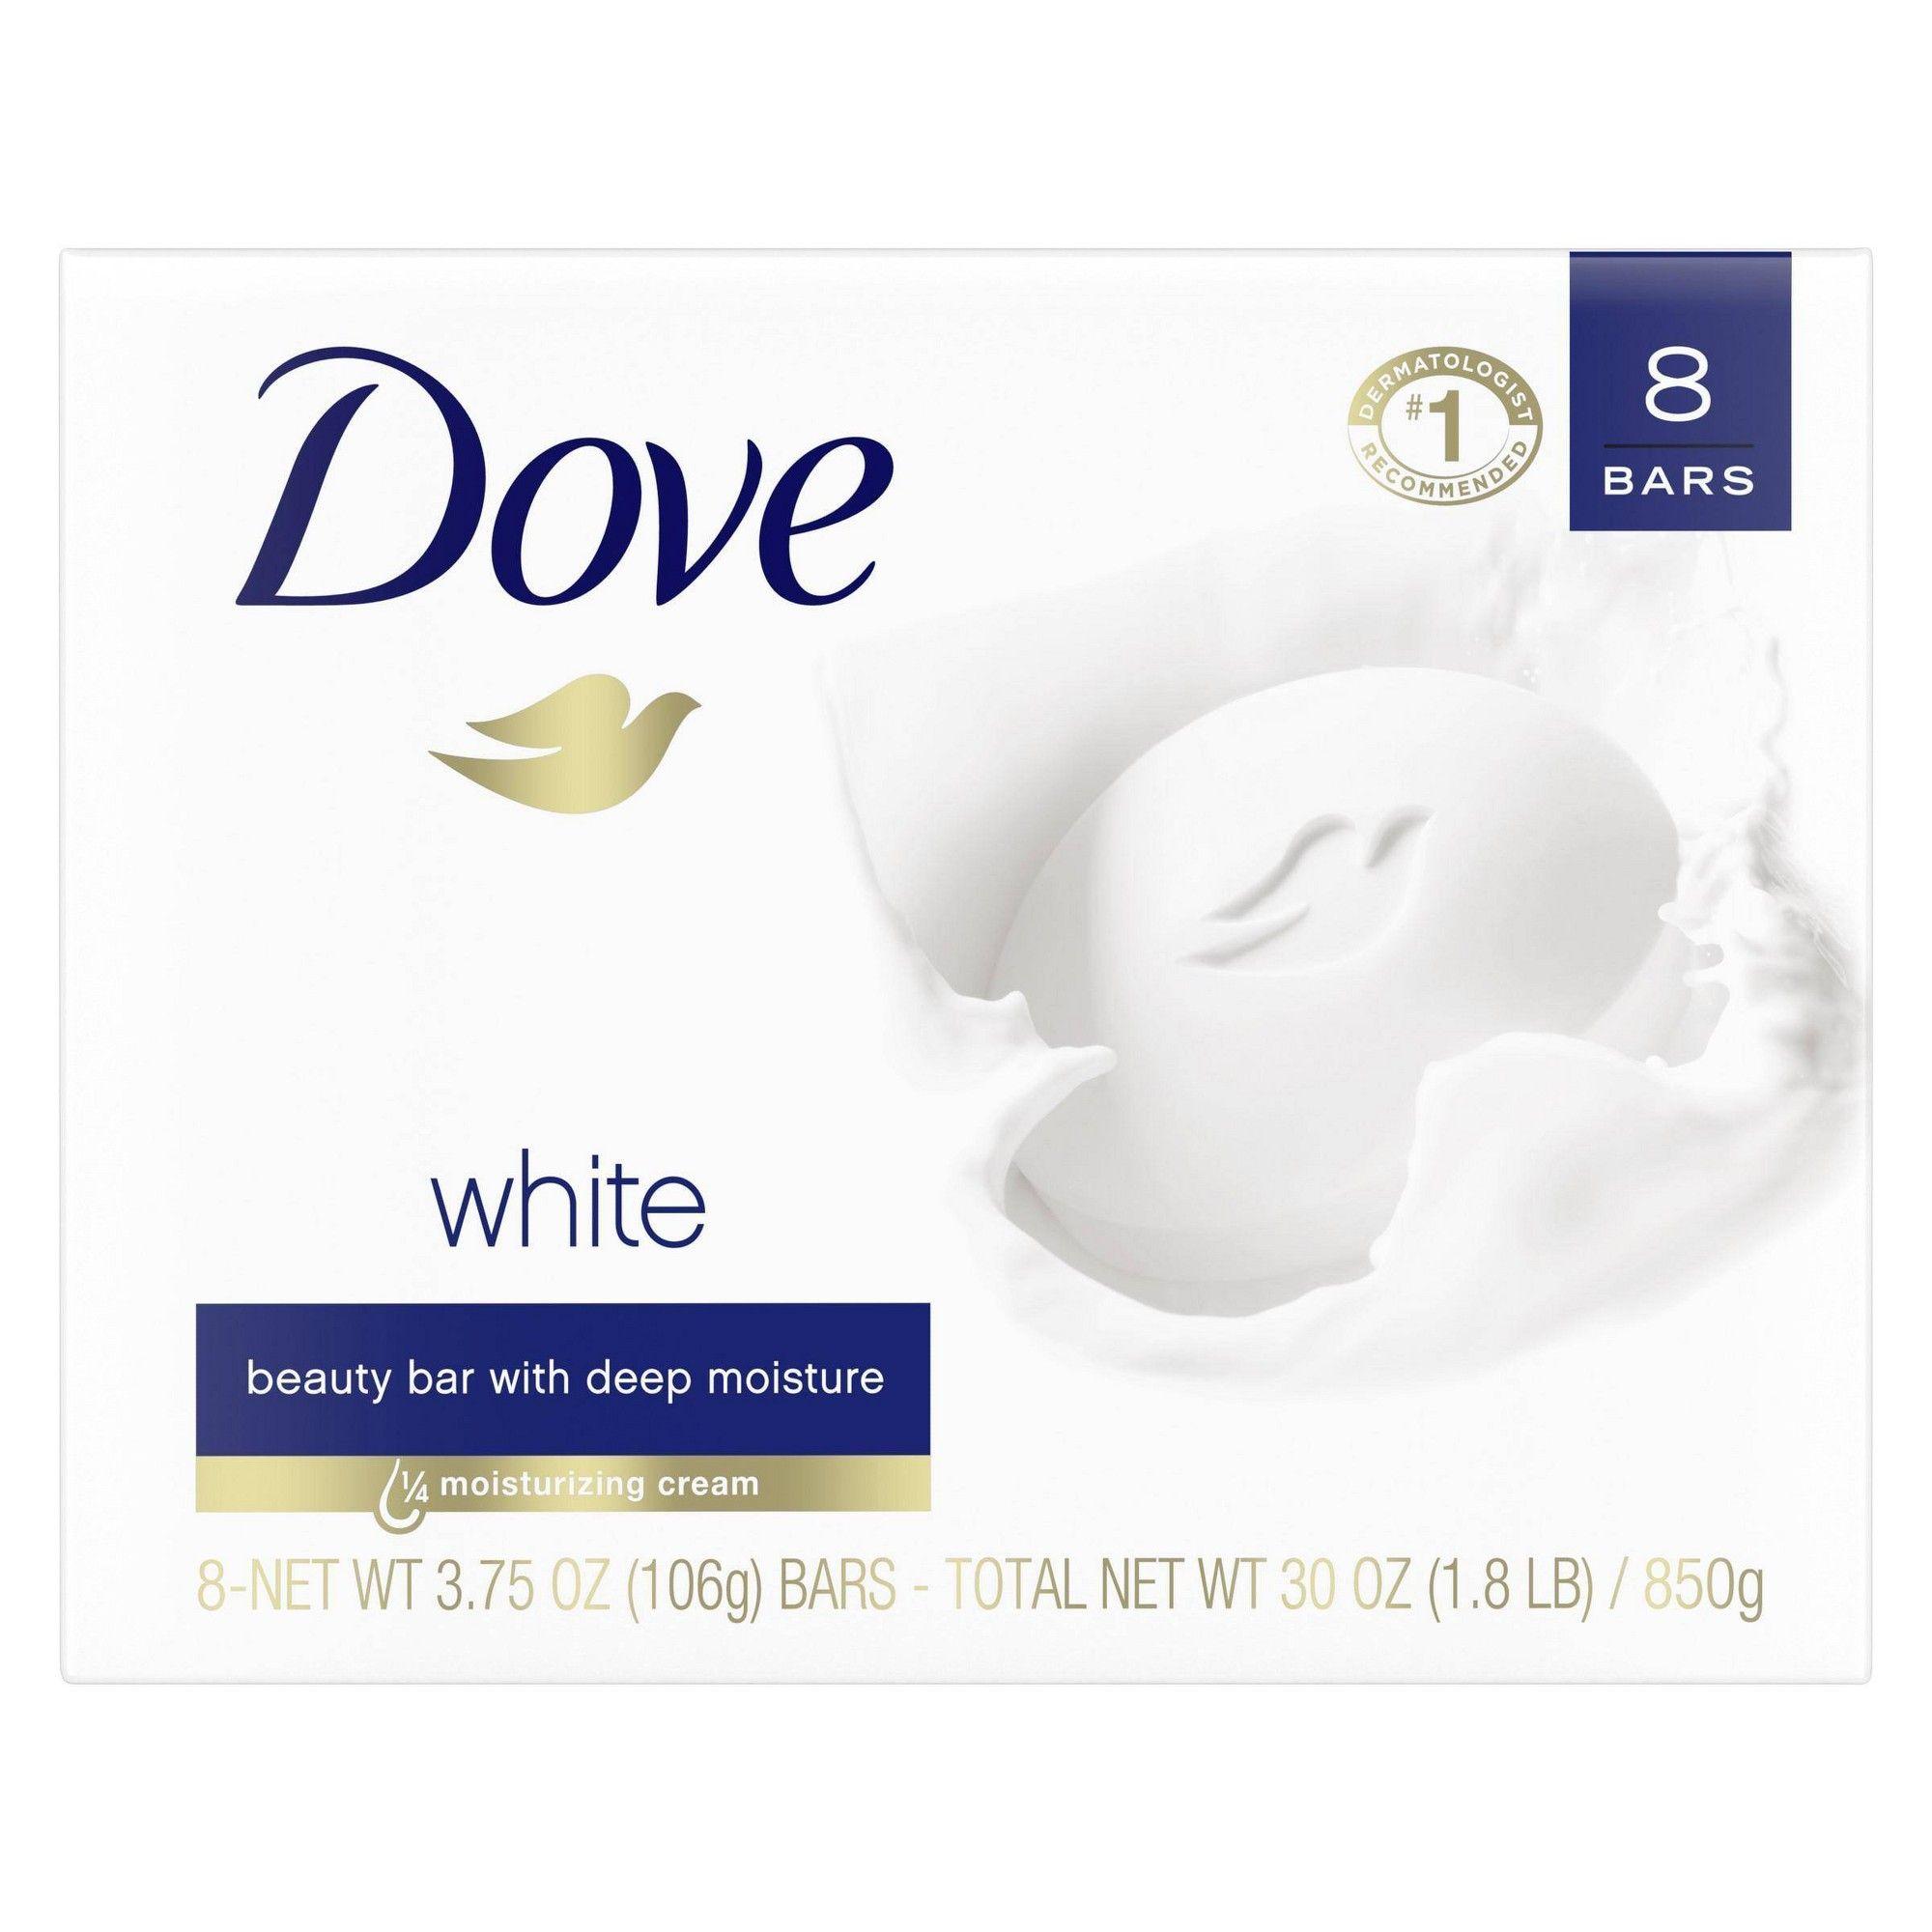 Dove Beauty Bar White 4oz/8pk Beauty bar, Dove bar